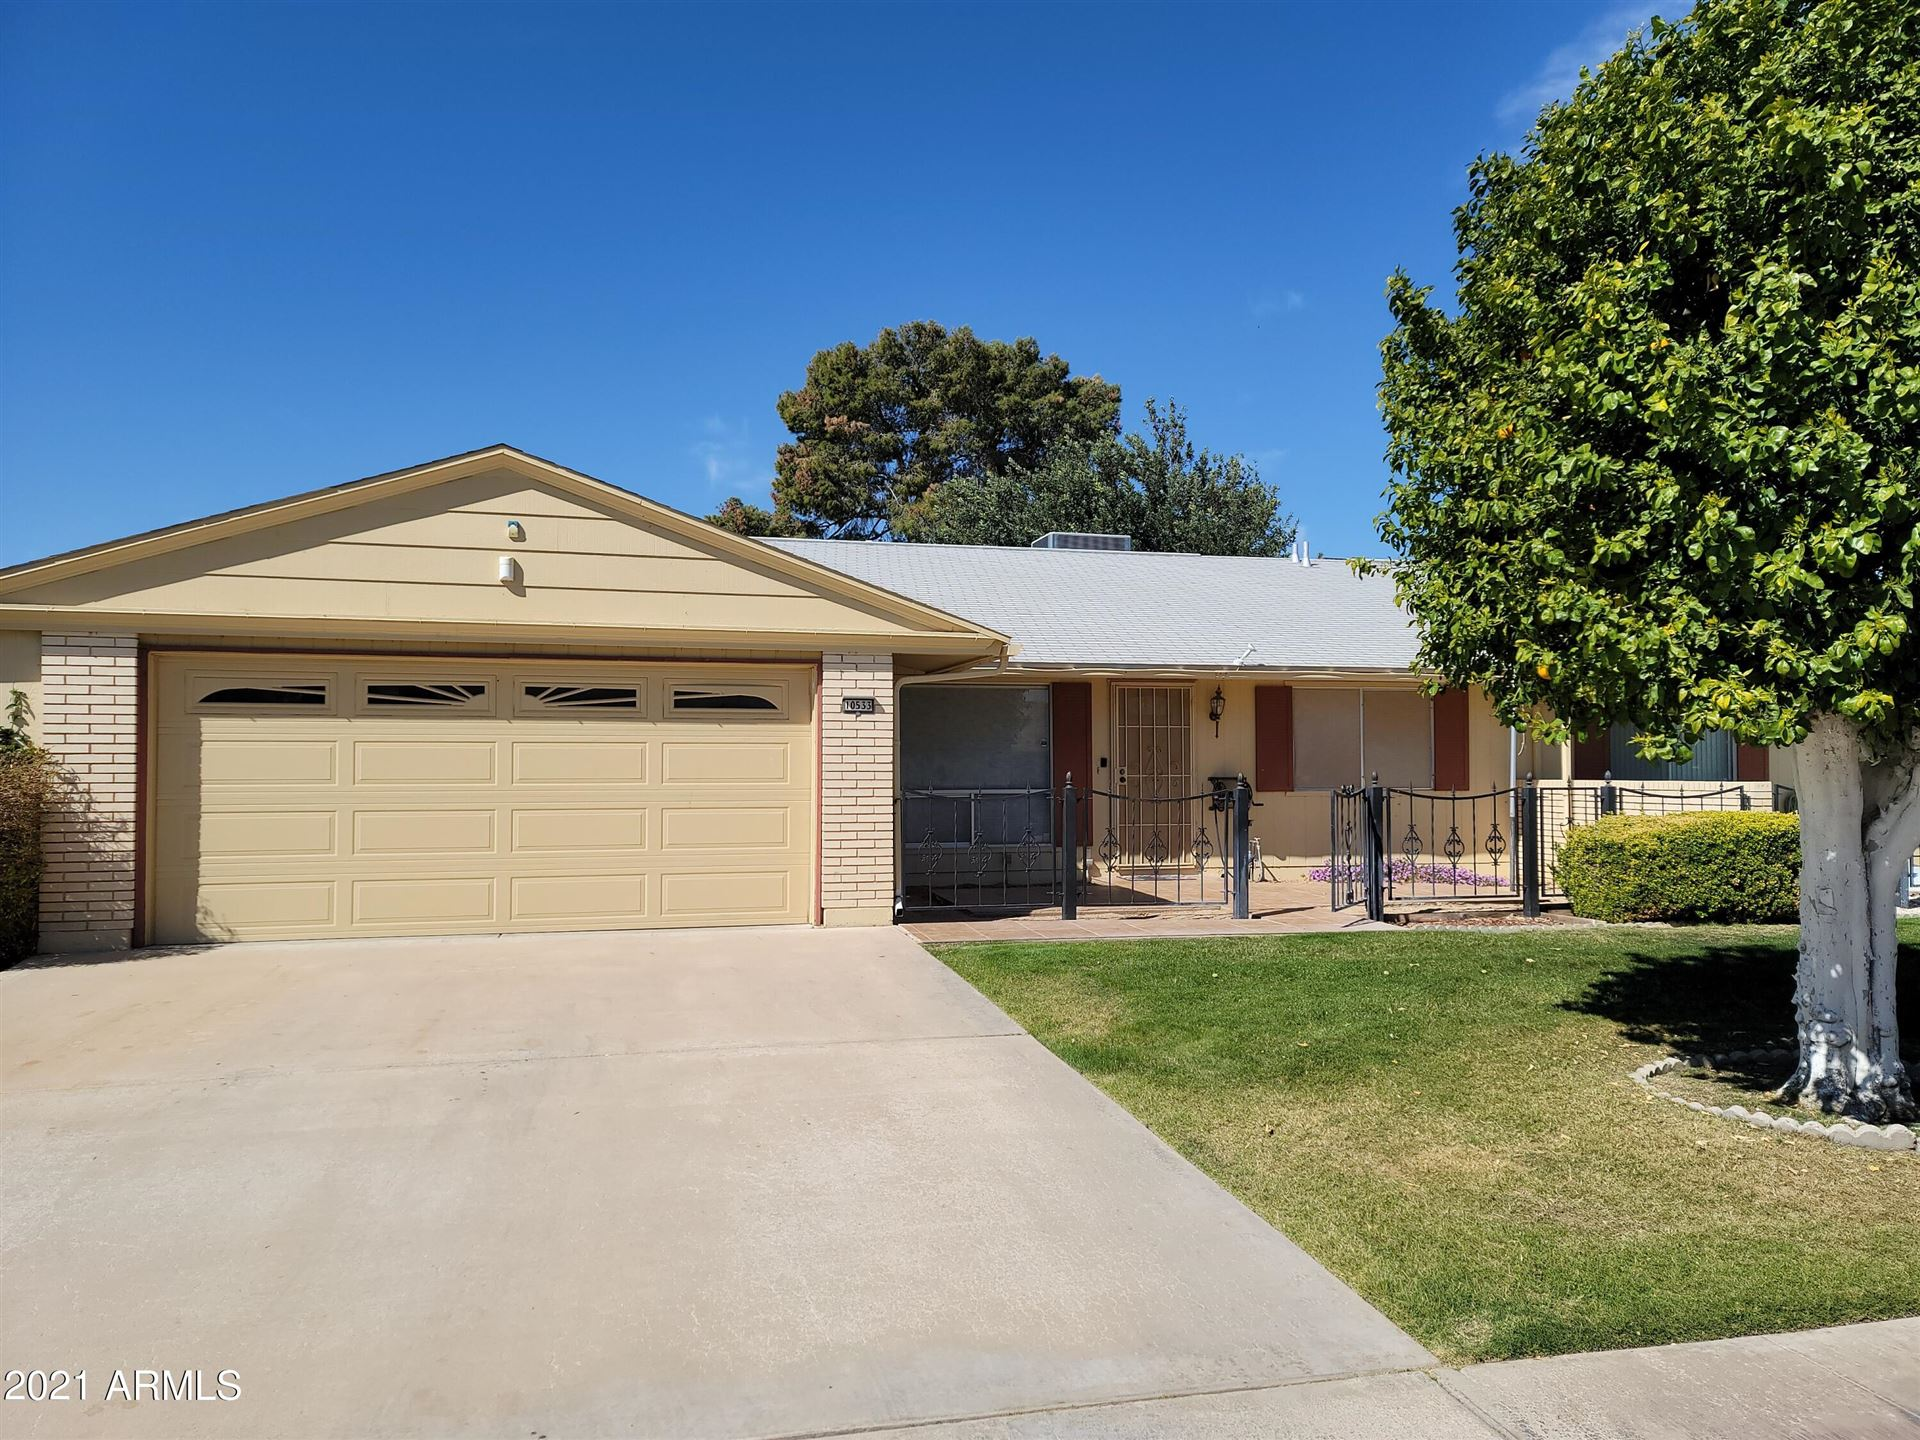 Photo of 10533 W TROPICANA Circle, Sun City, AZ 85351 (MLS # 6201895)